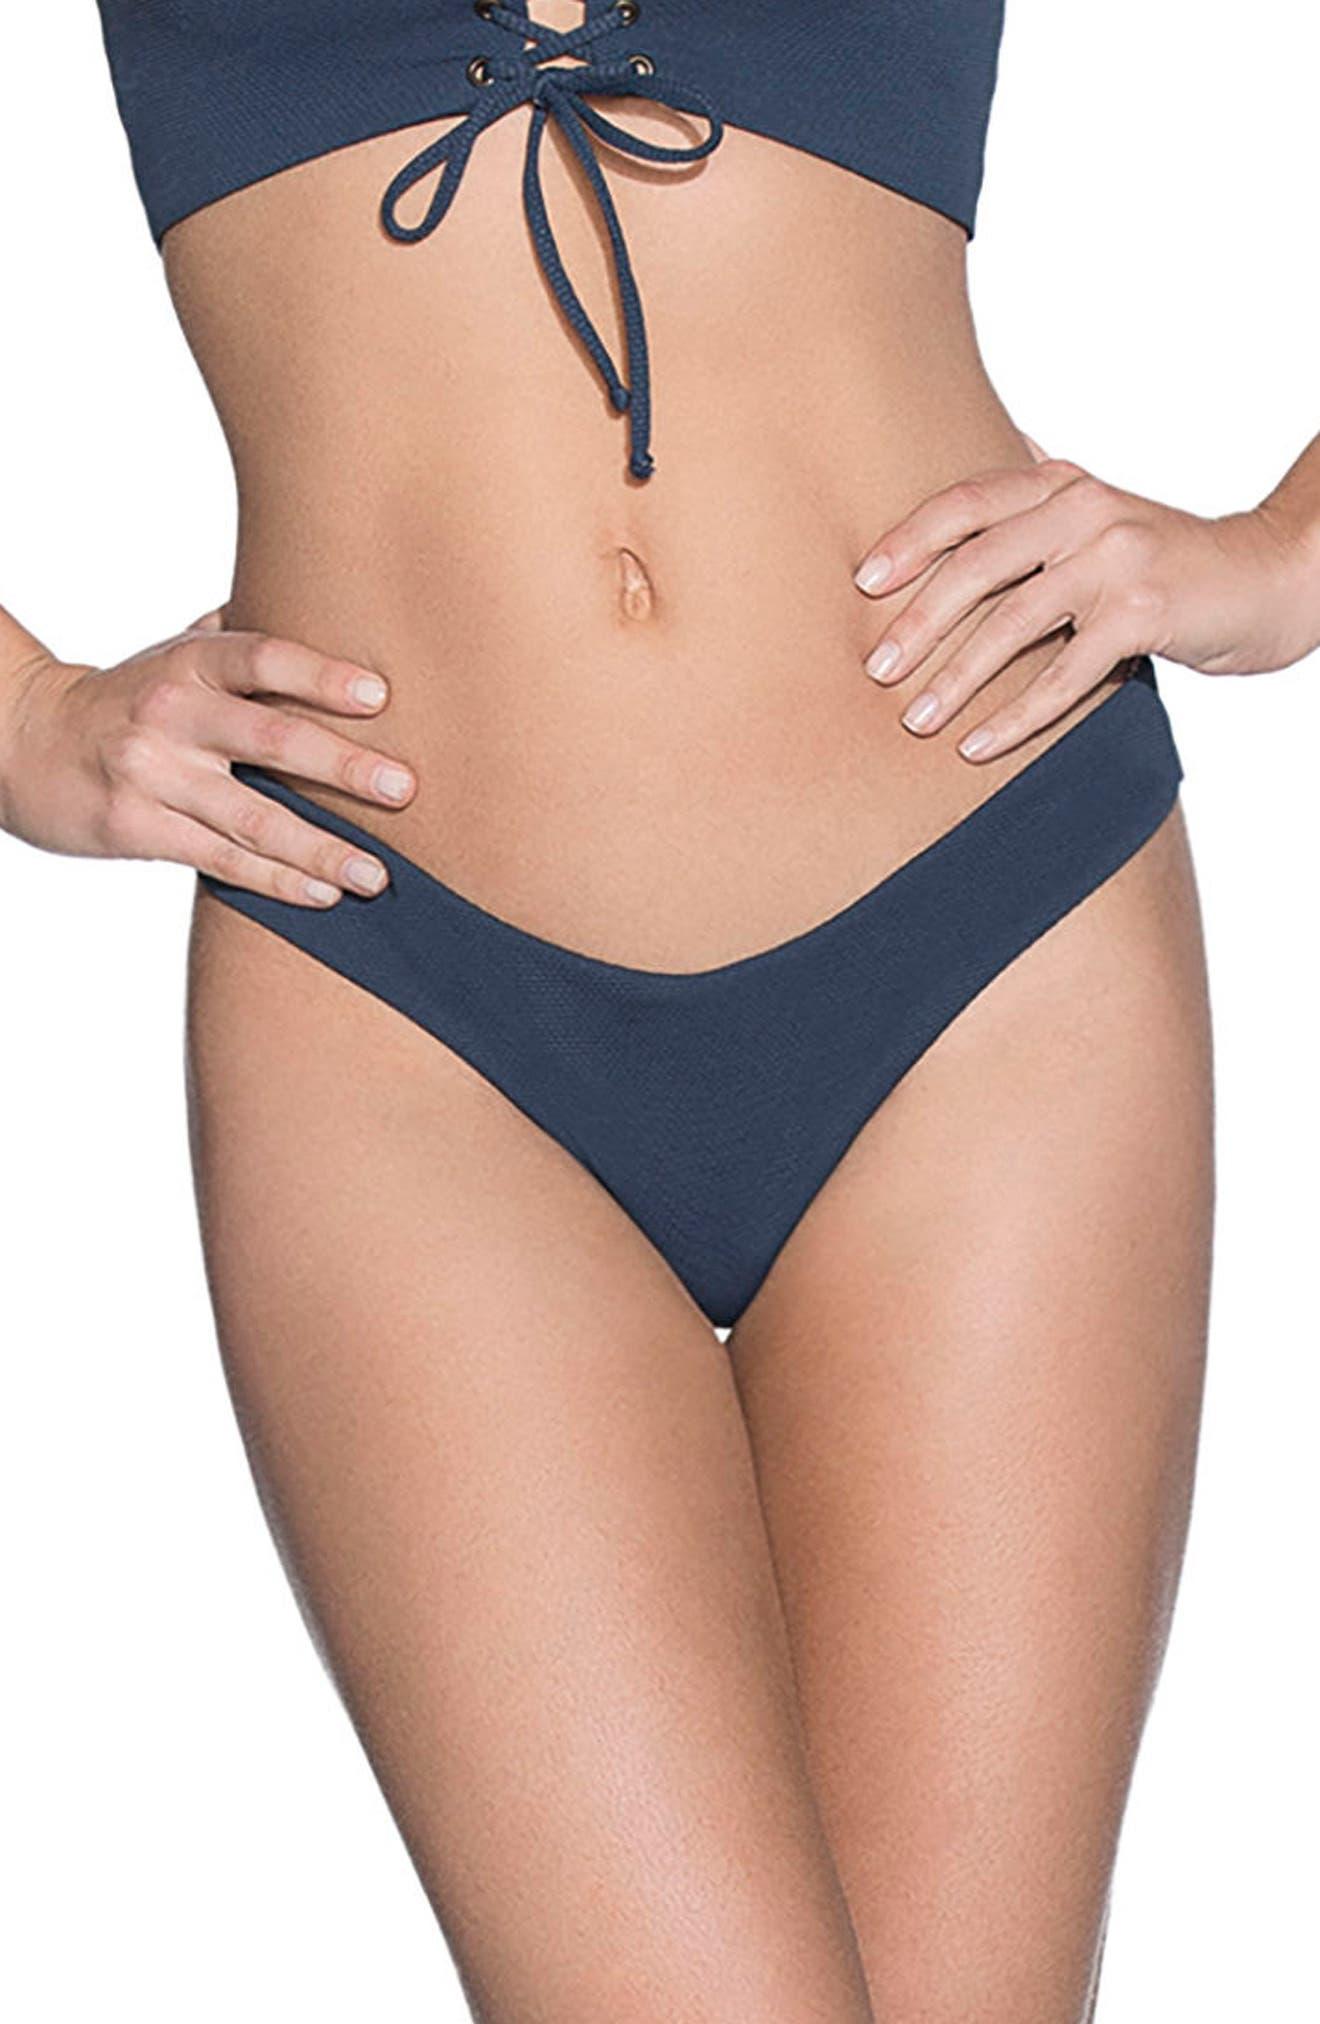 Stargazer Reversible Cheeky Bikini Bottoms,                             Main thumbnail 1, color,                             400